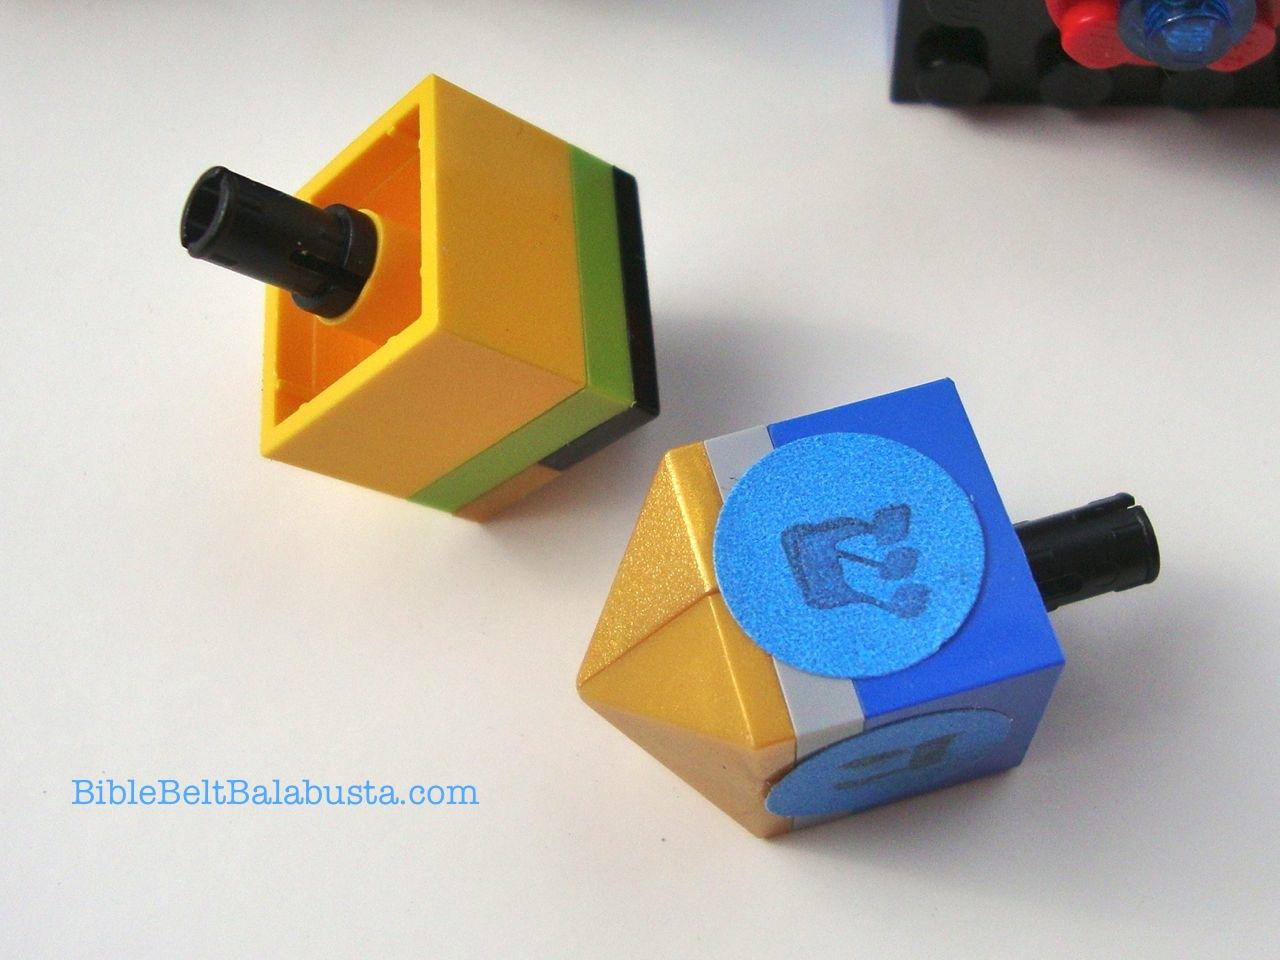 Diy Lego Dreidel Kits Bible Belt Balabusta